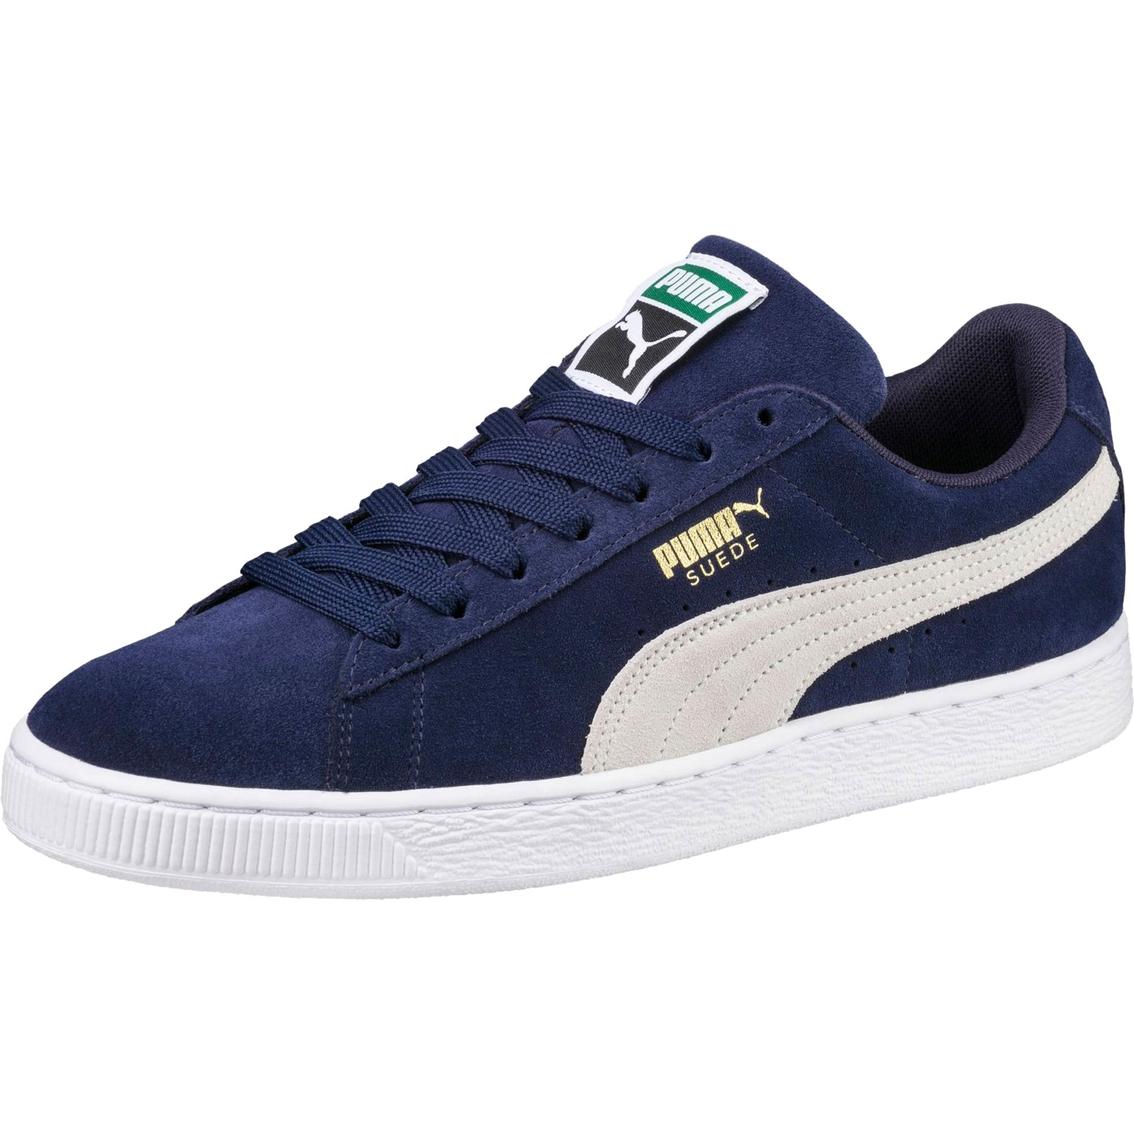 26be7efa3fc Puma Men s Suede Classic Plus Sneakers